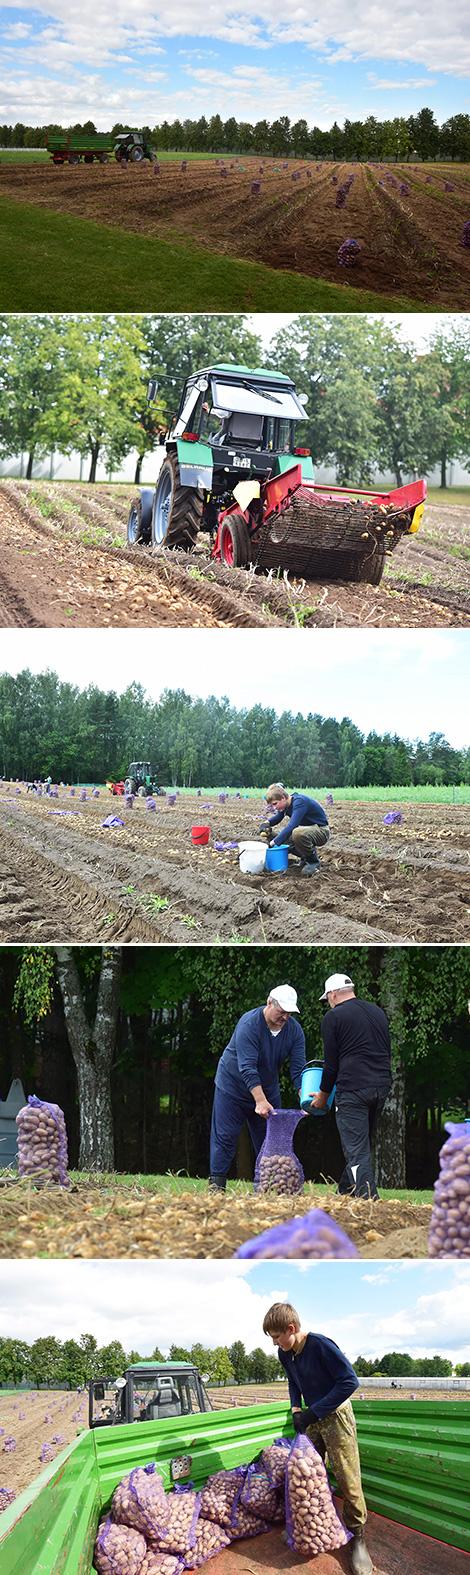 Lukashenko harvests potatoes in his garden on Saturday